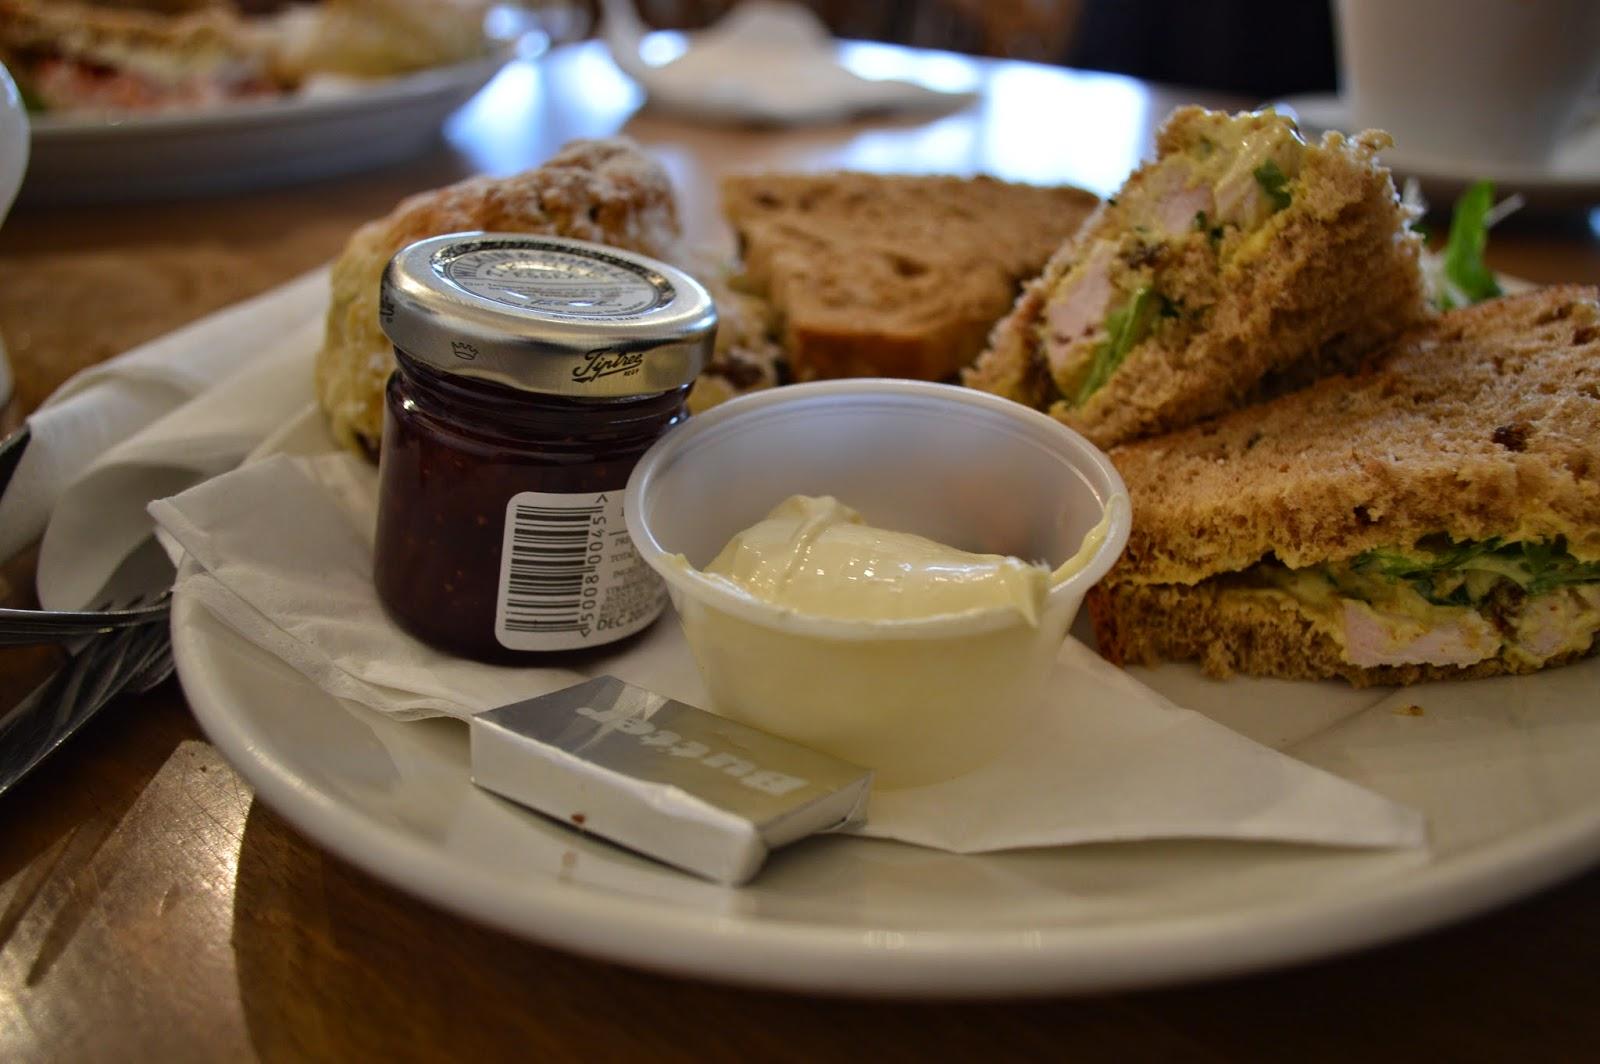 Heybridge, Tiptree, Maldon, tearooms, cream tea, afternoon tea, scones, jam, photo, photograph, boat,